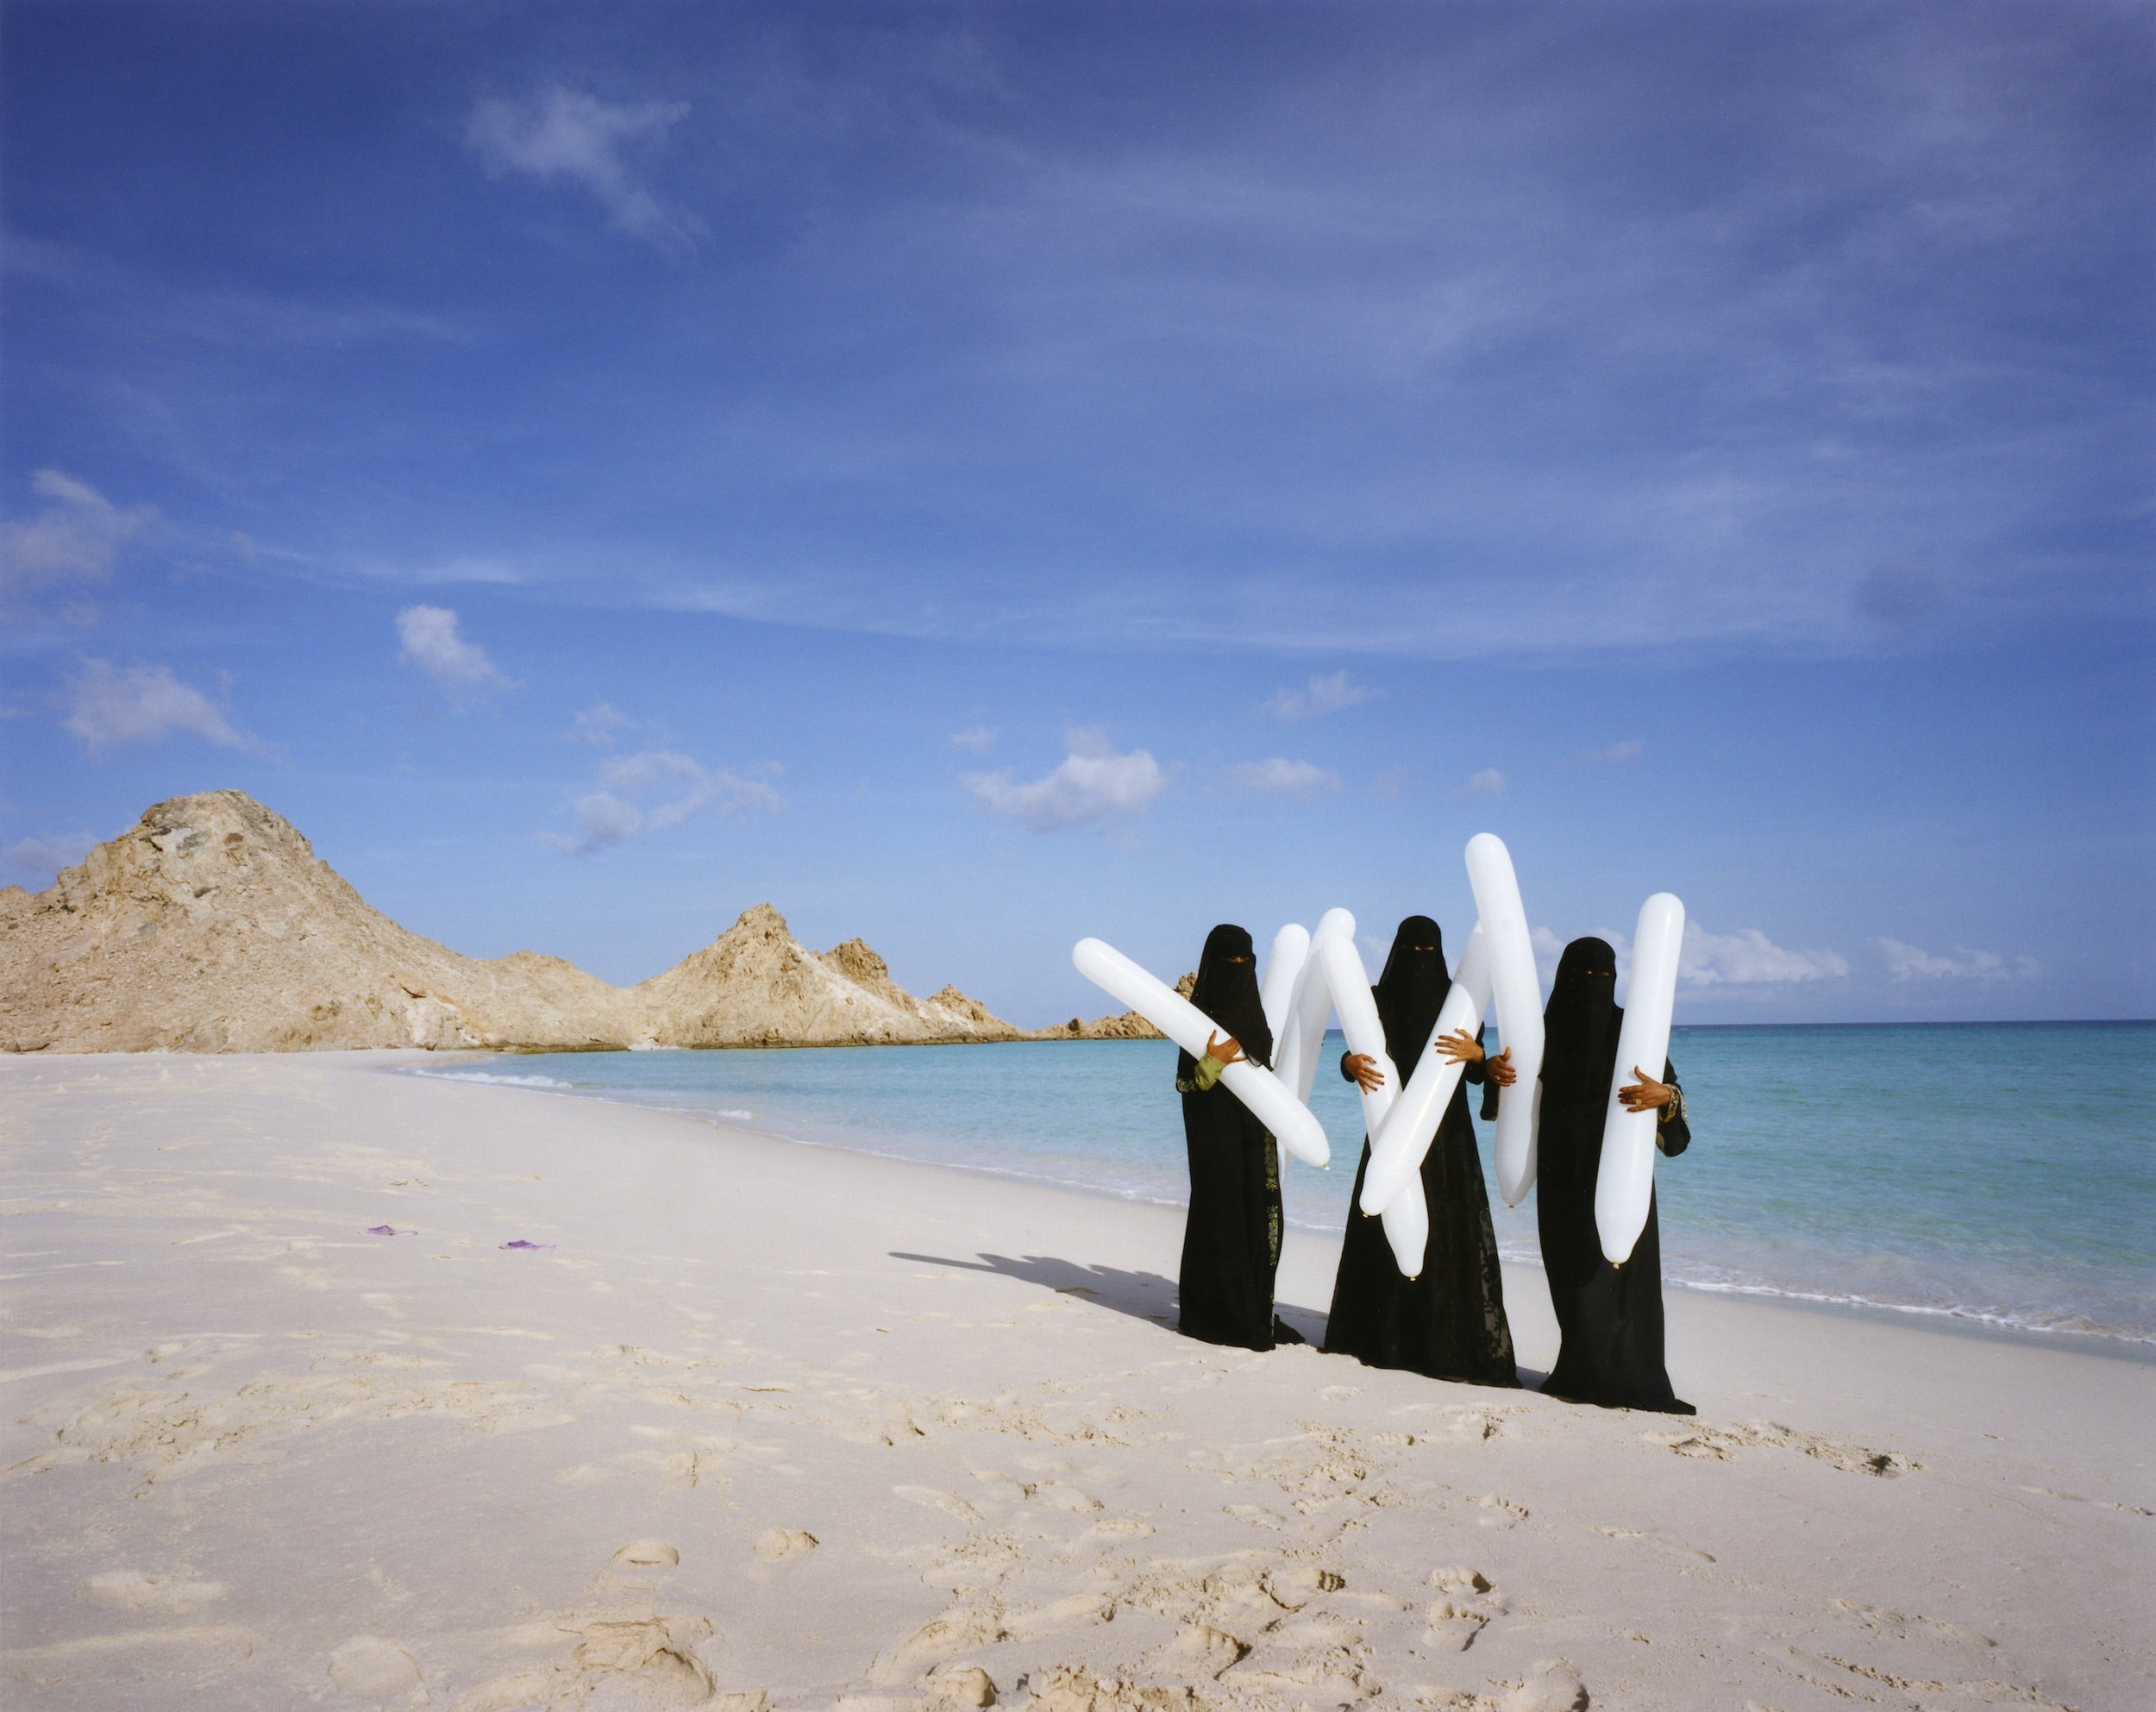 Dubai Photo Exhibition Brings Global Spotlight to the Emirate's New Favorite Medium